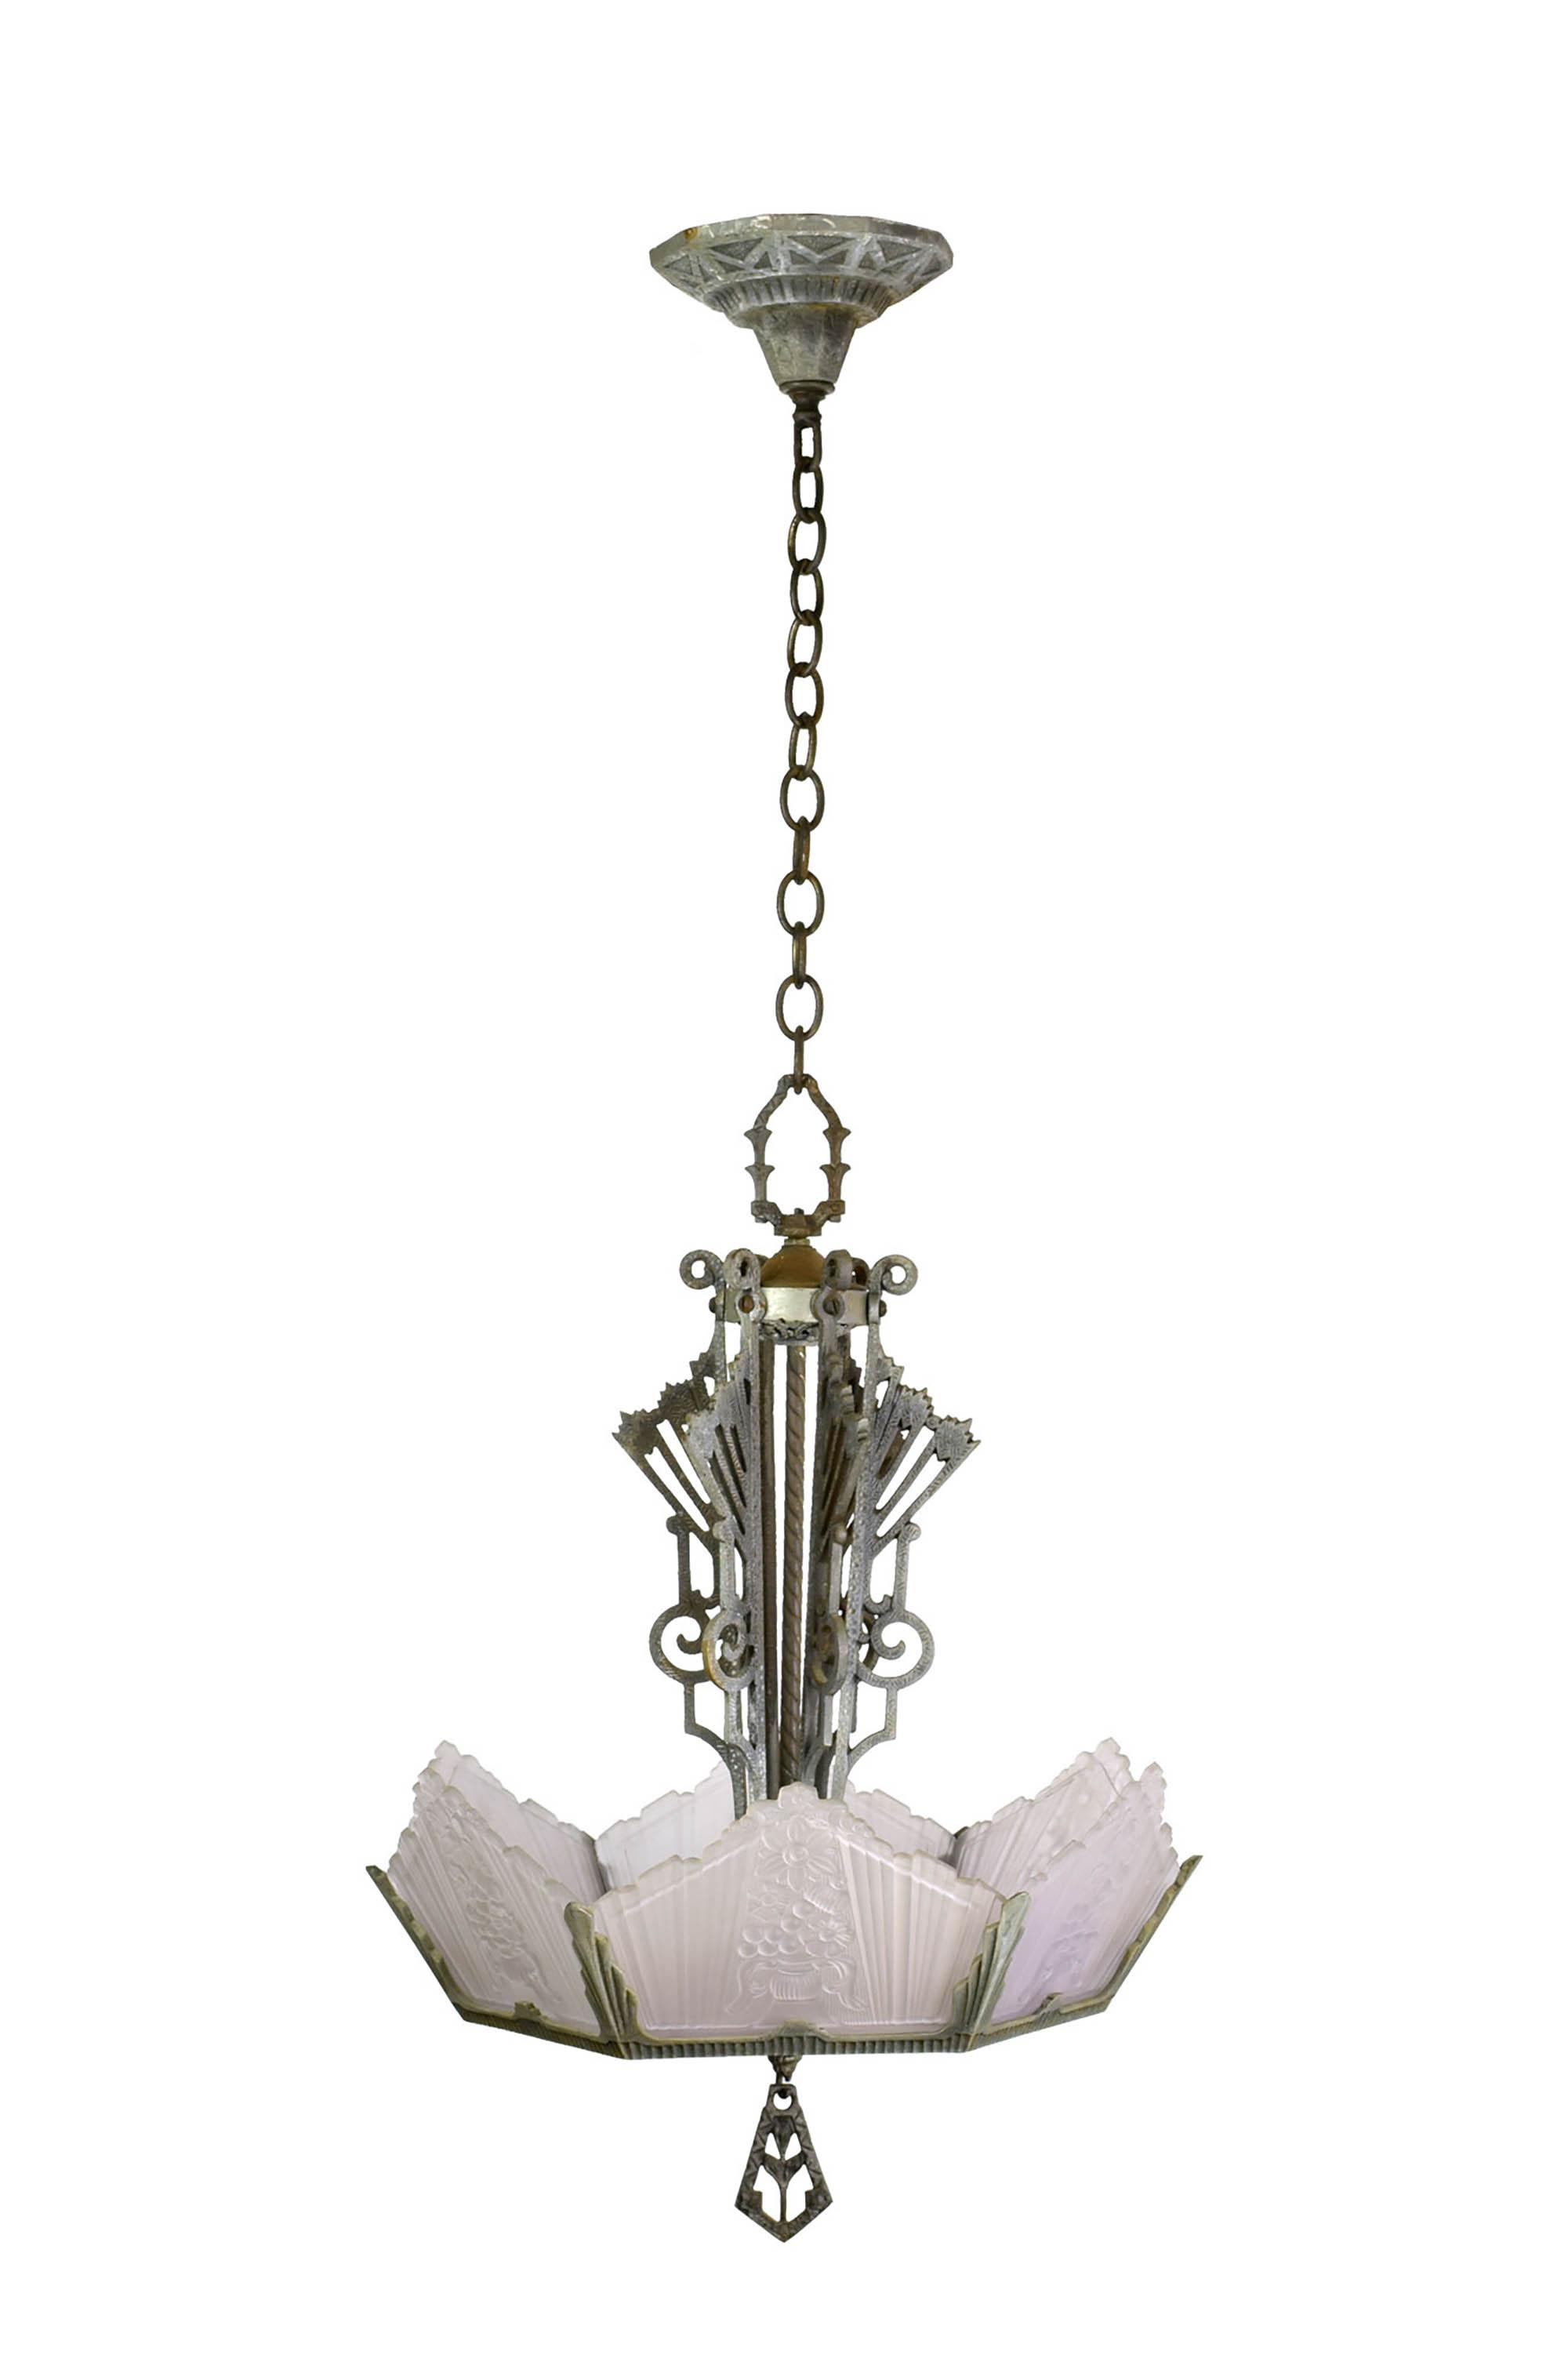 46940-art-deco-chandelier-MAIN.jpg